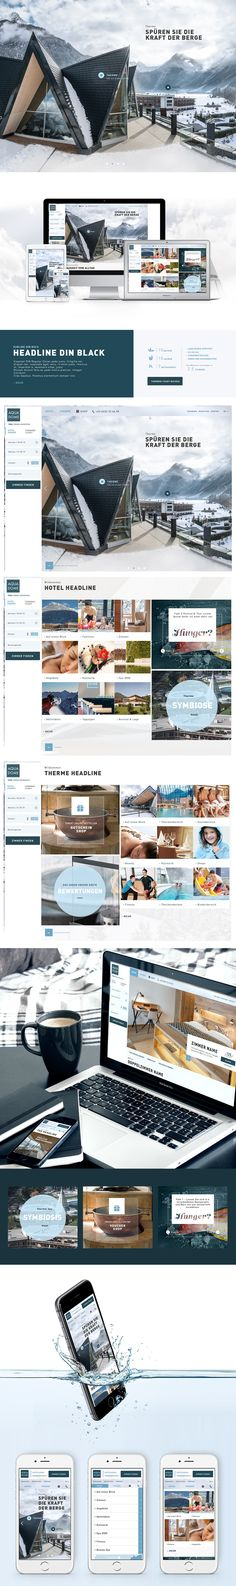 Aqua Dome - Webdesign on Web Design Served